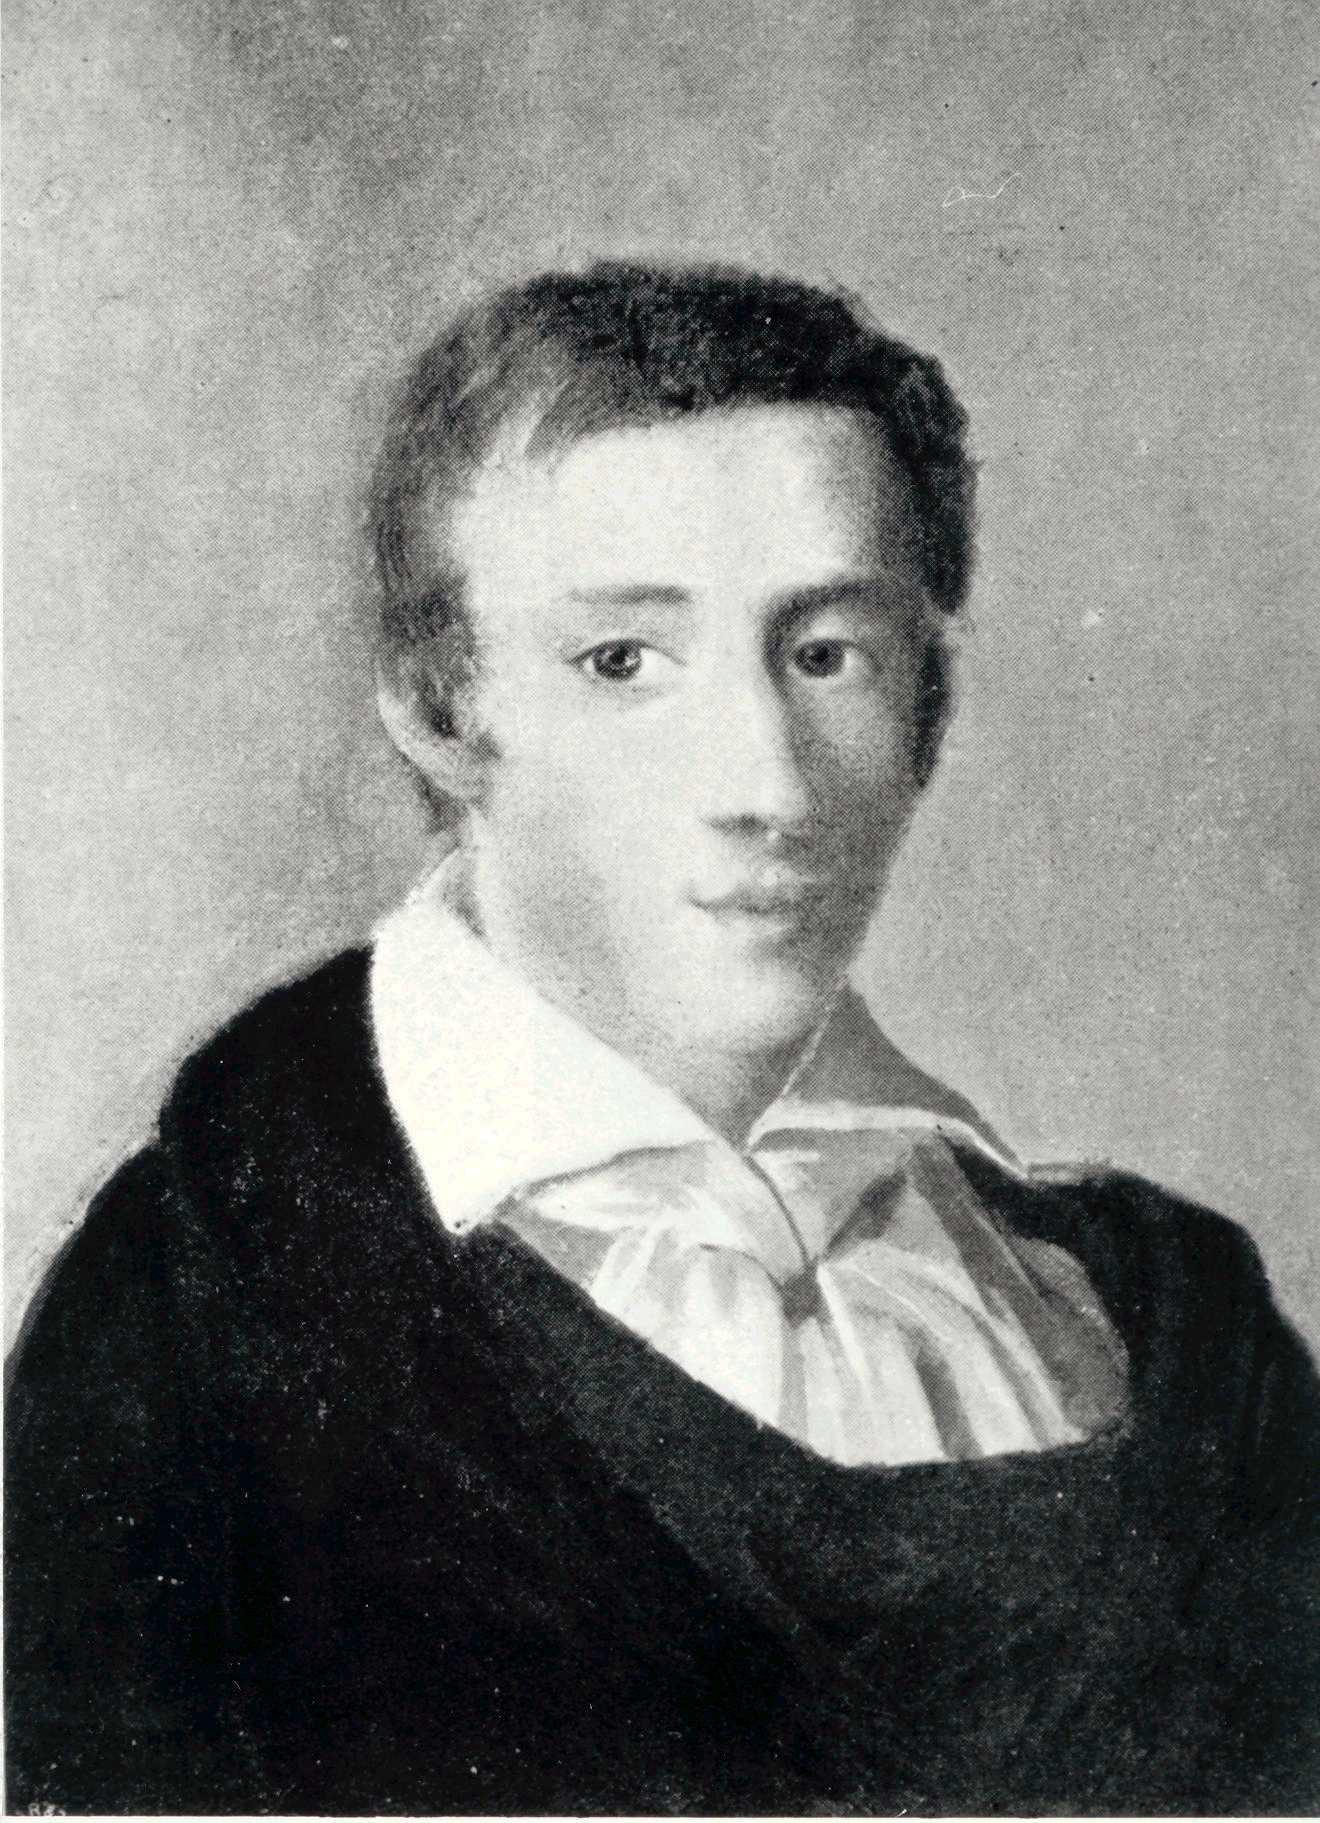 Fryderyk_Chopin